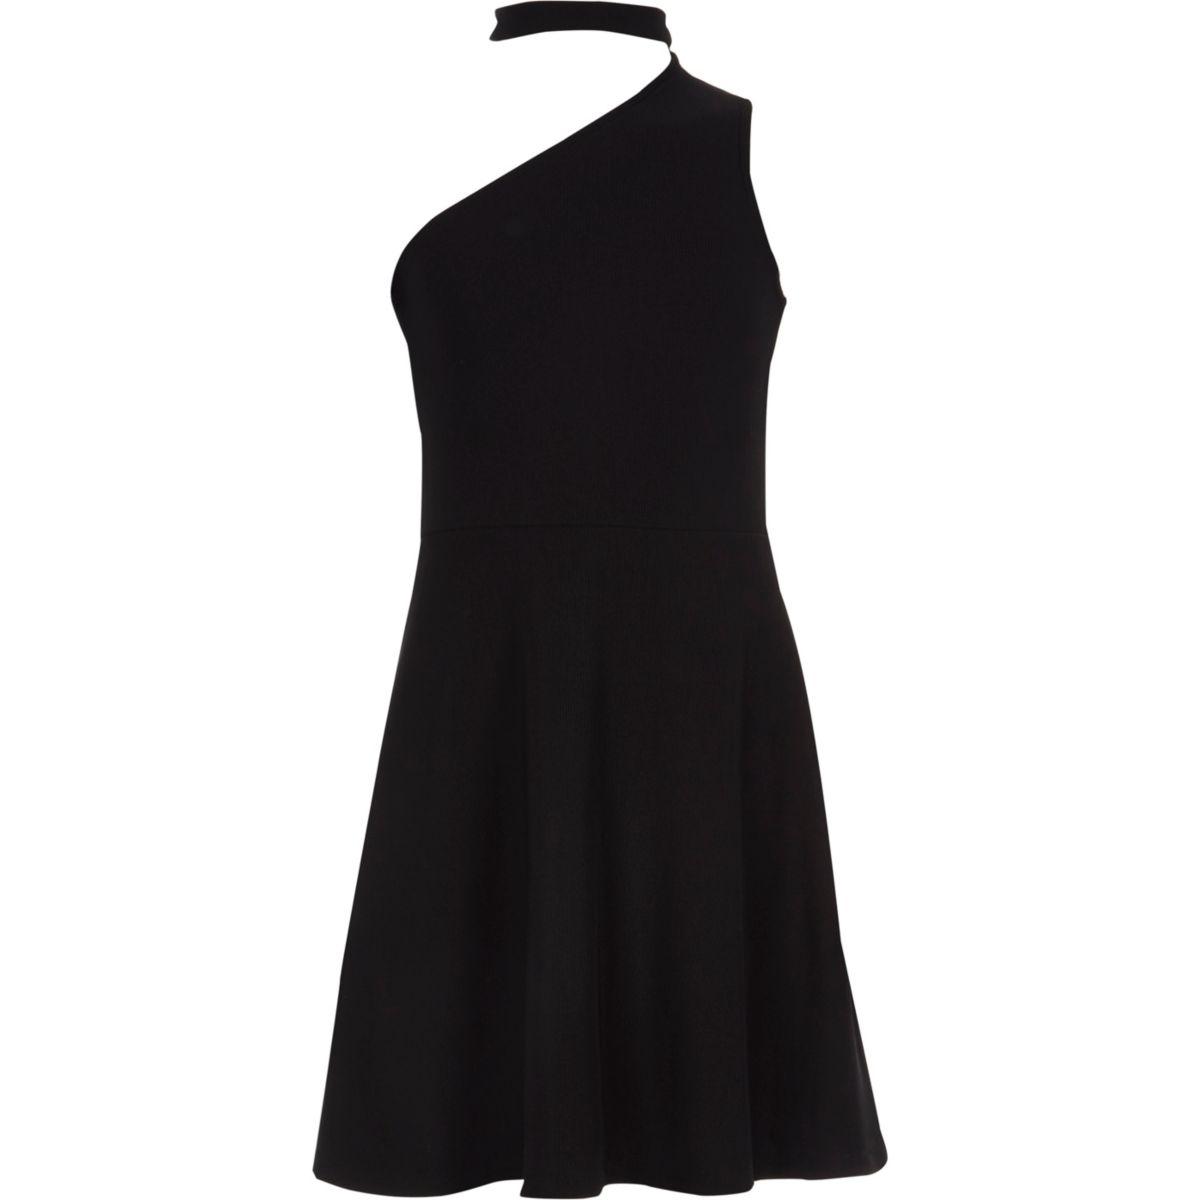 Girls black one shoulder choker dress